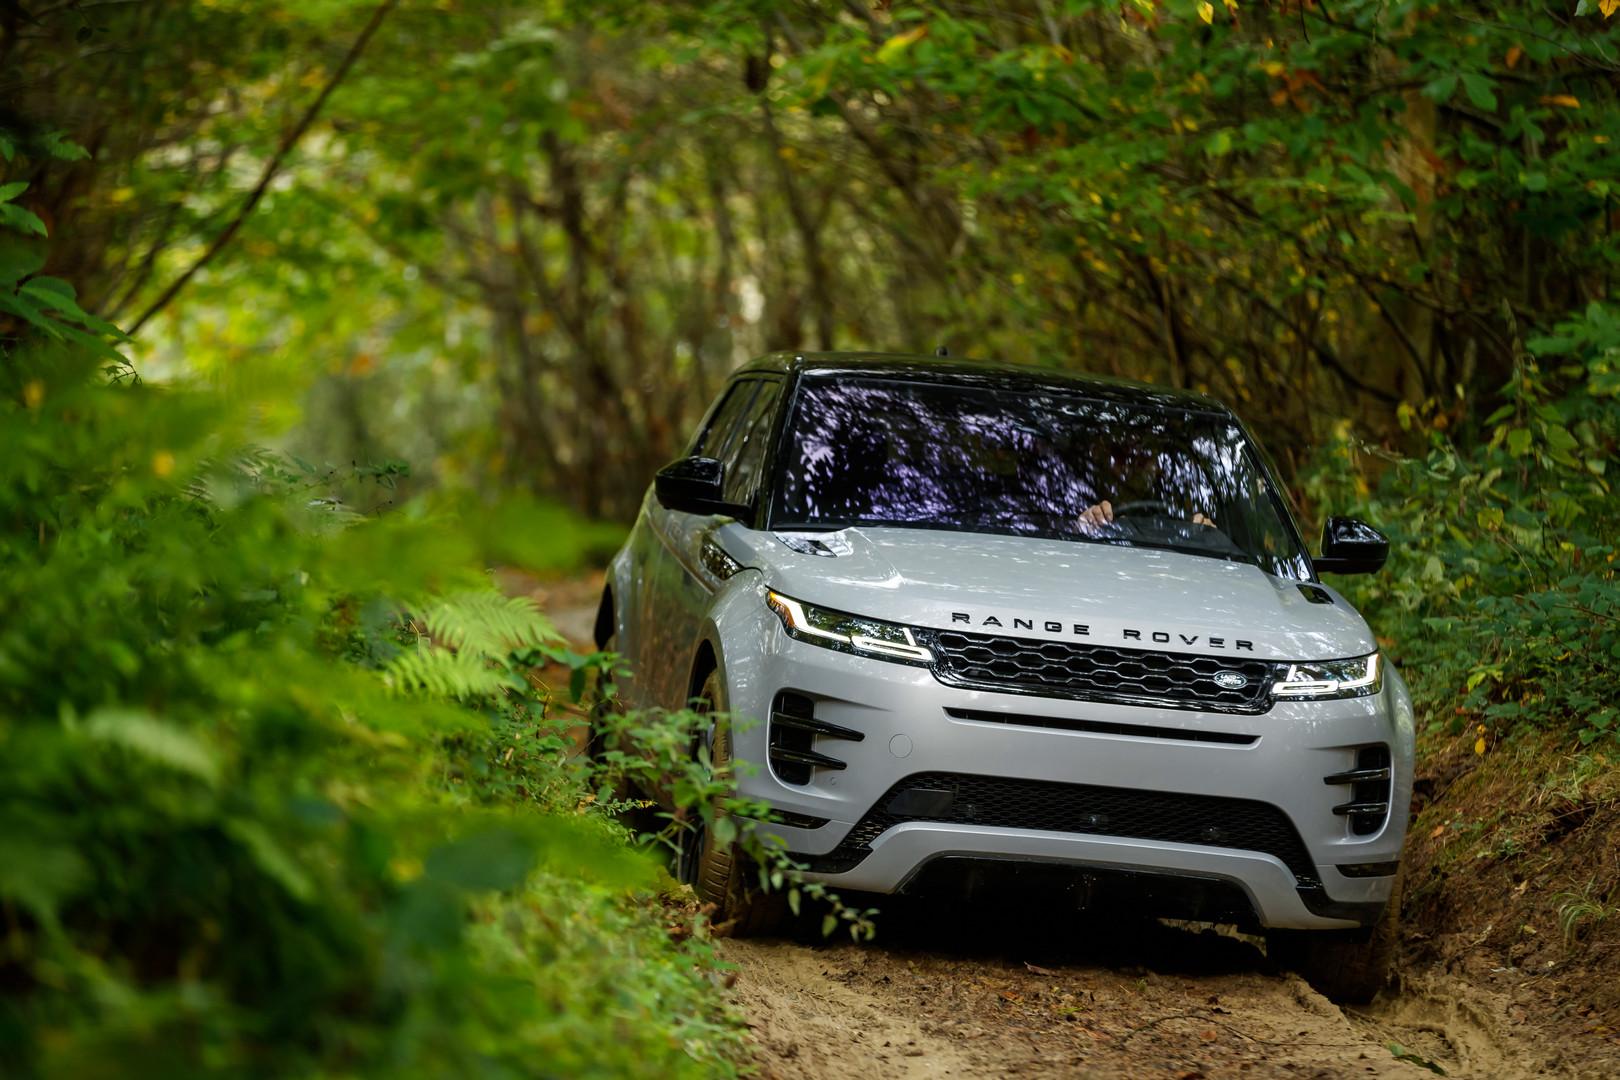 2019 Range Rover Evoque Exterior